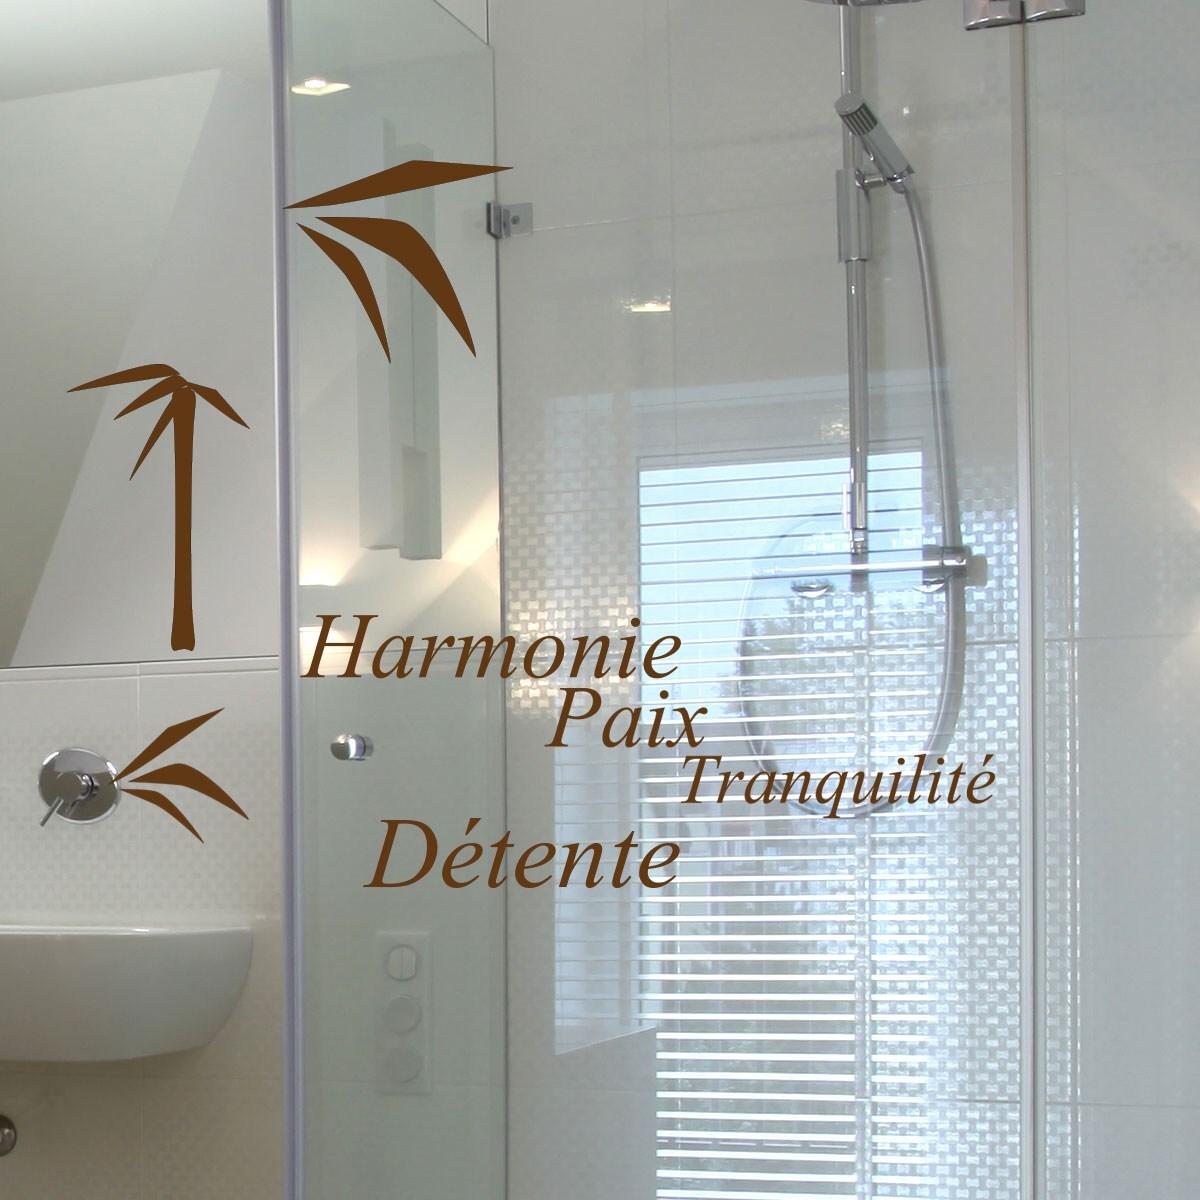 Salle de bain enfant deco 79 photo gallery pictures to pin - Stickers deco salle de bain ...